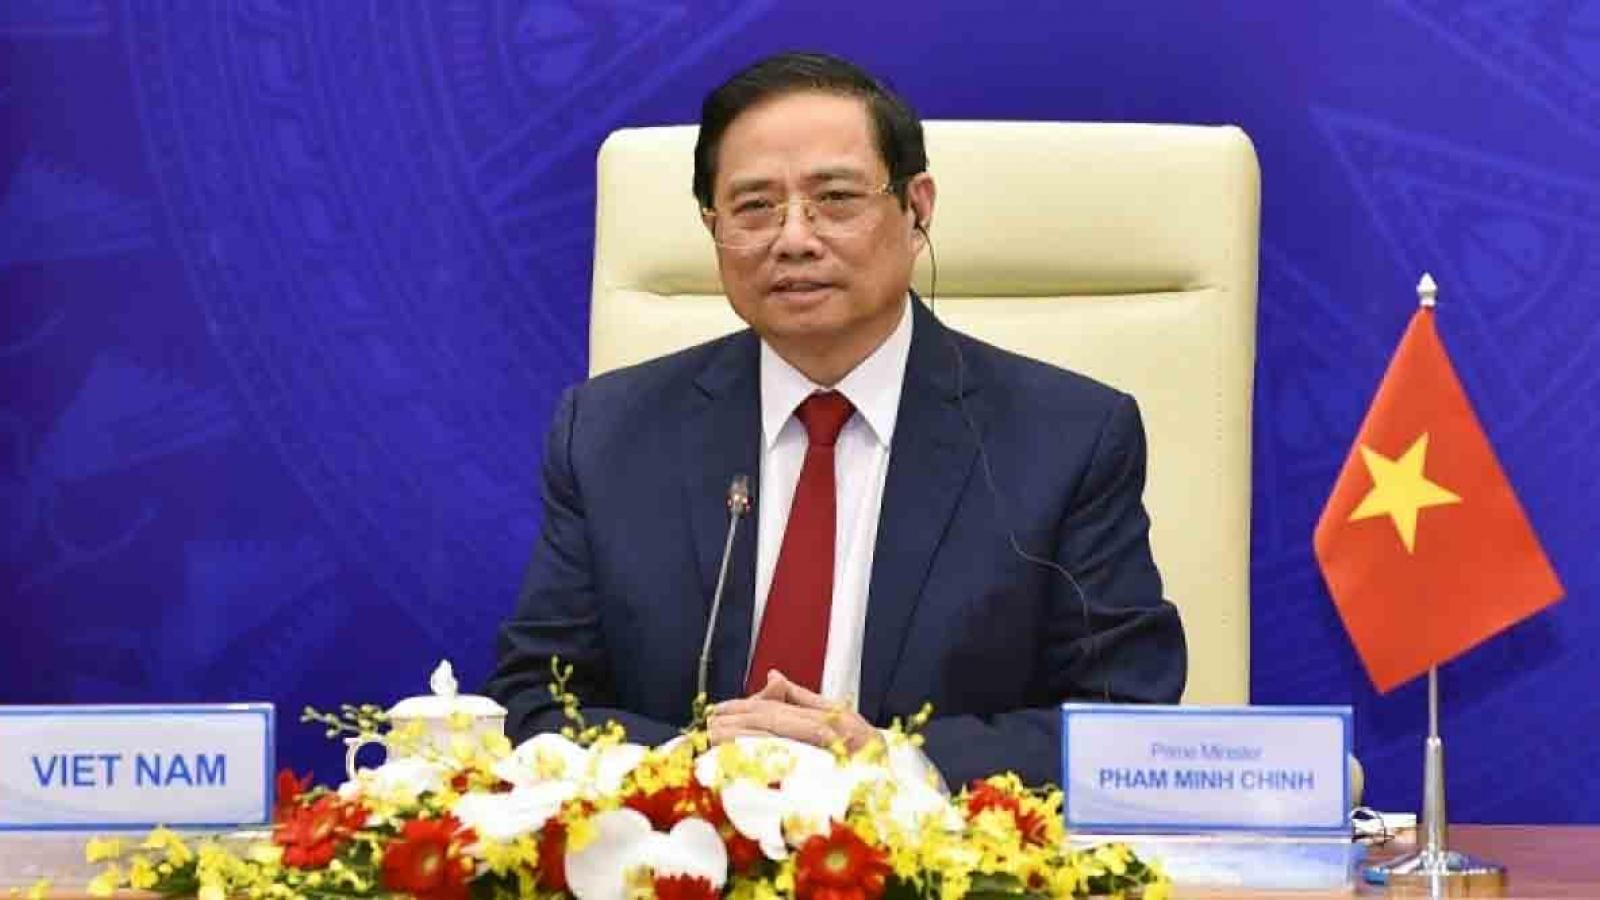 Vietnam diversifies energy sources, focuses on renewable energy, says PM